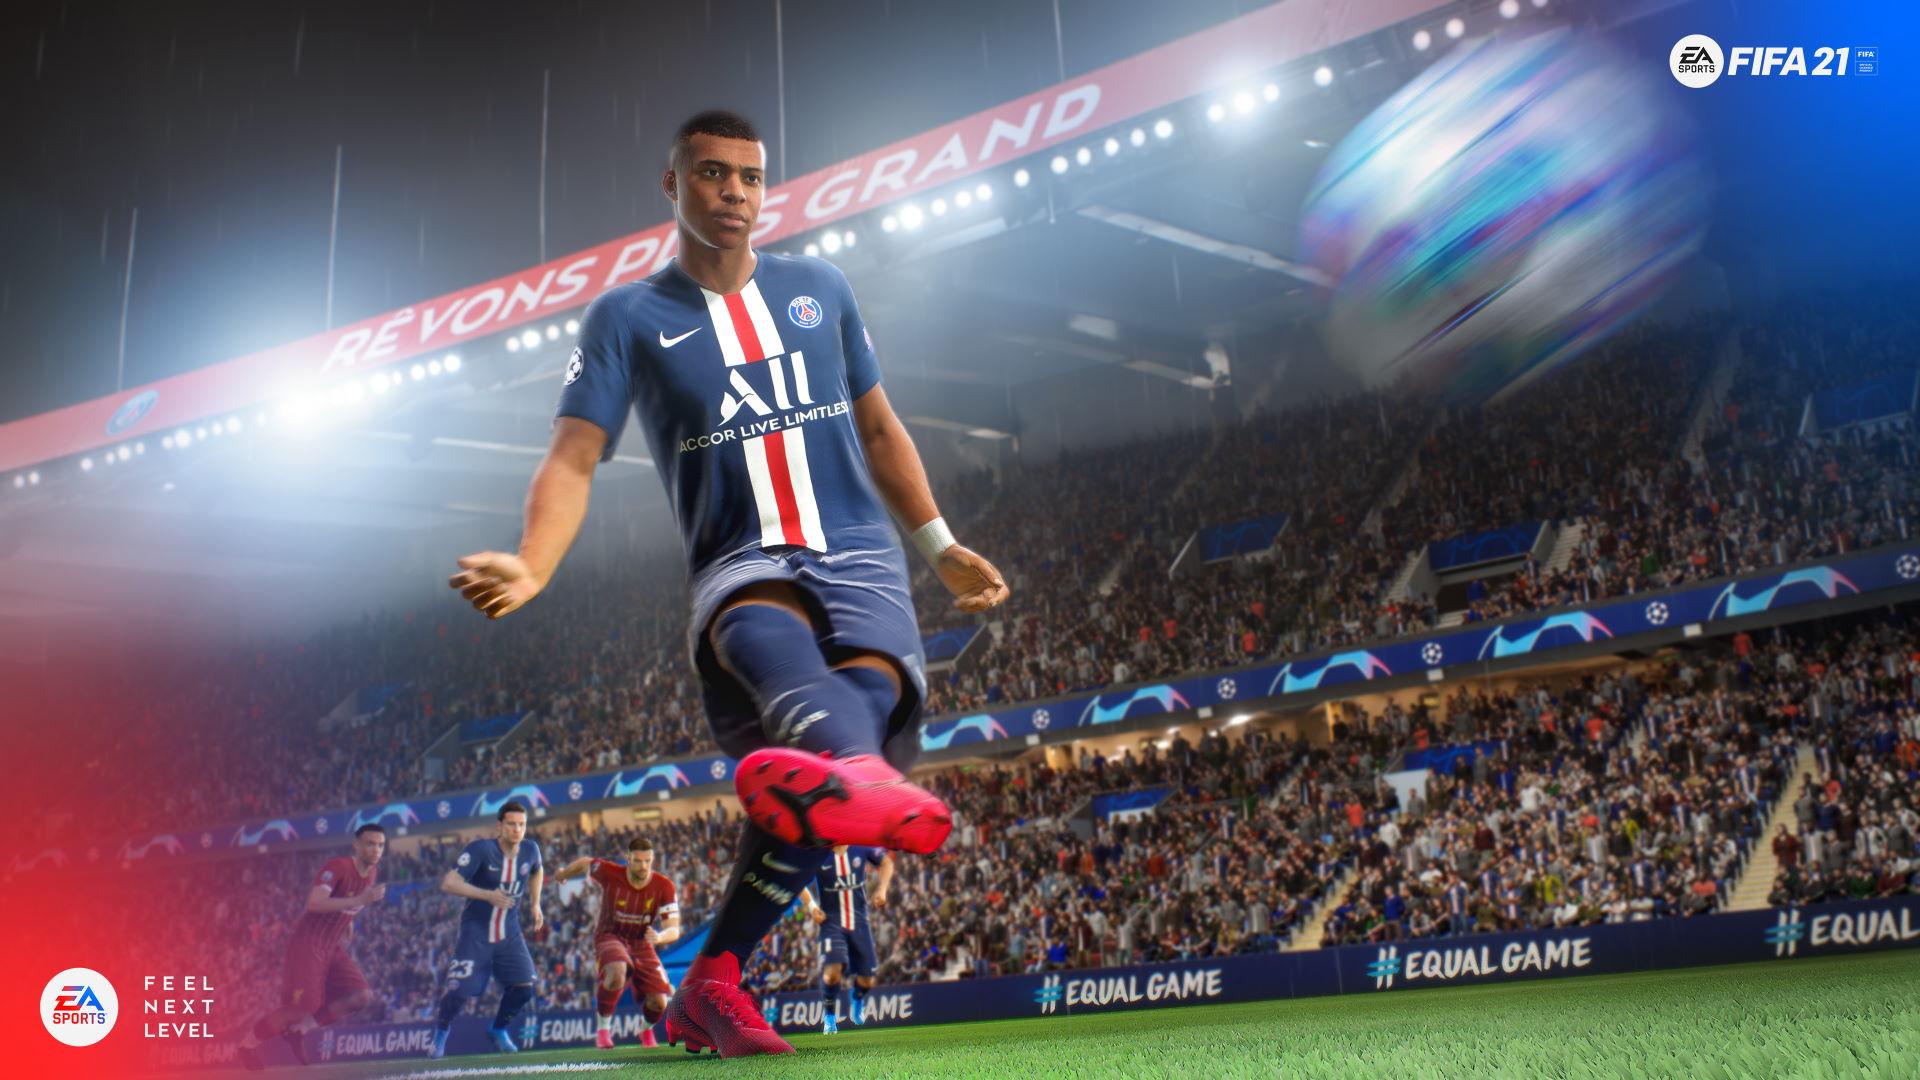 FIFA 21 - screenshot z gry na konsole